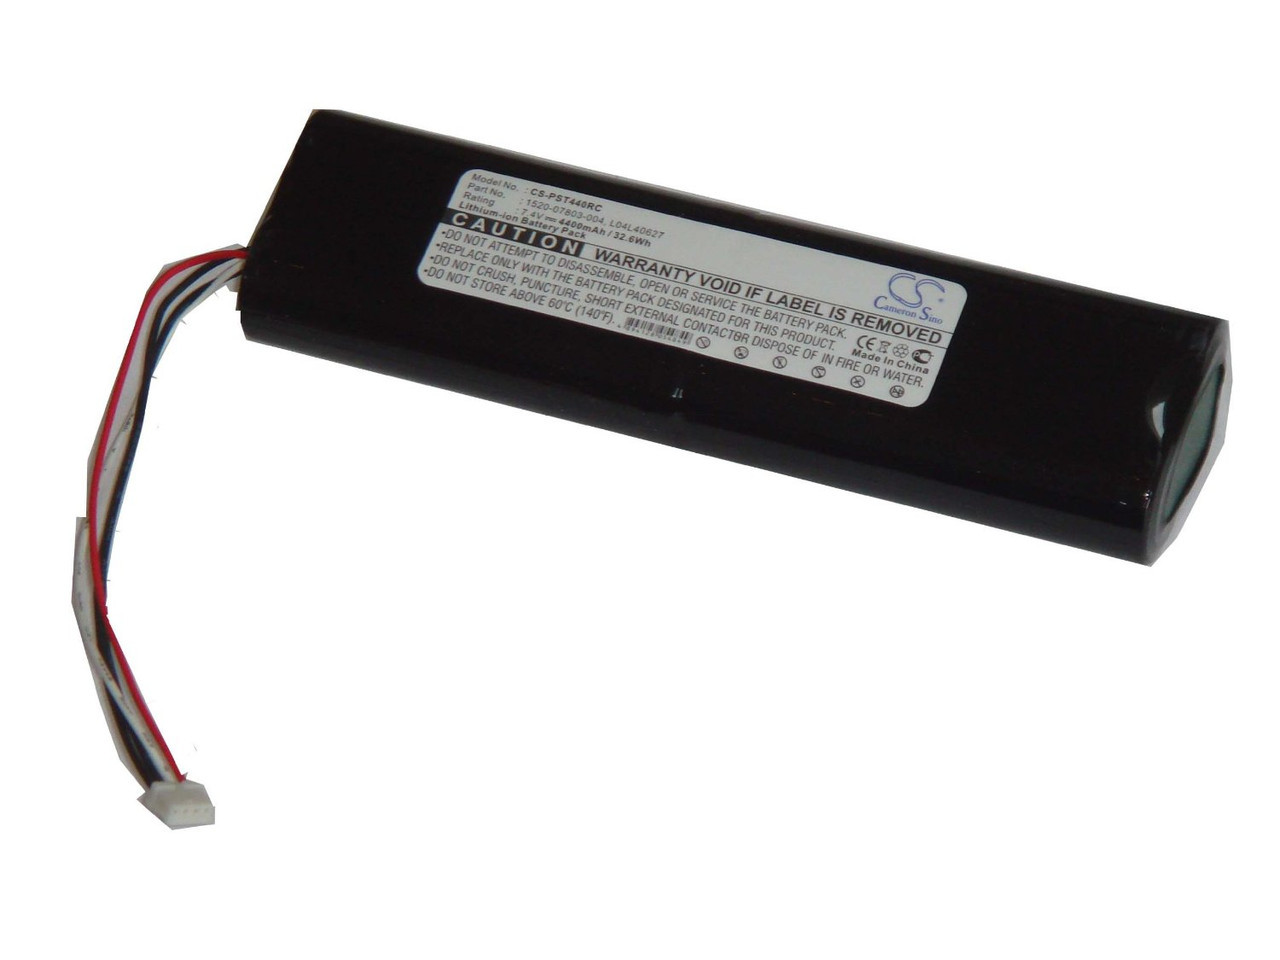 Polycom батарея для Soundstation2W 24 часа разговора (2200-07804-002)